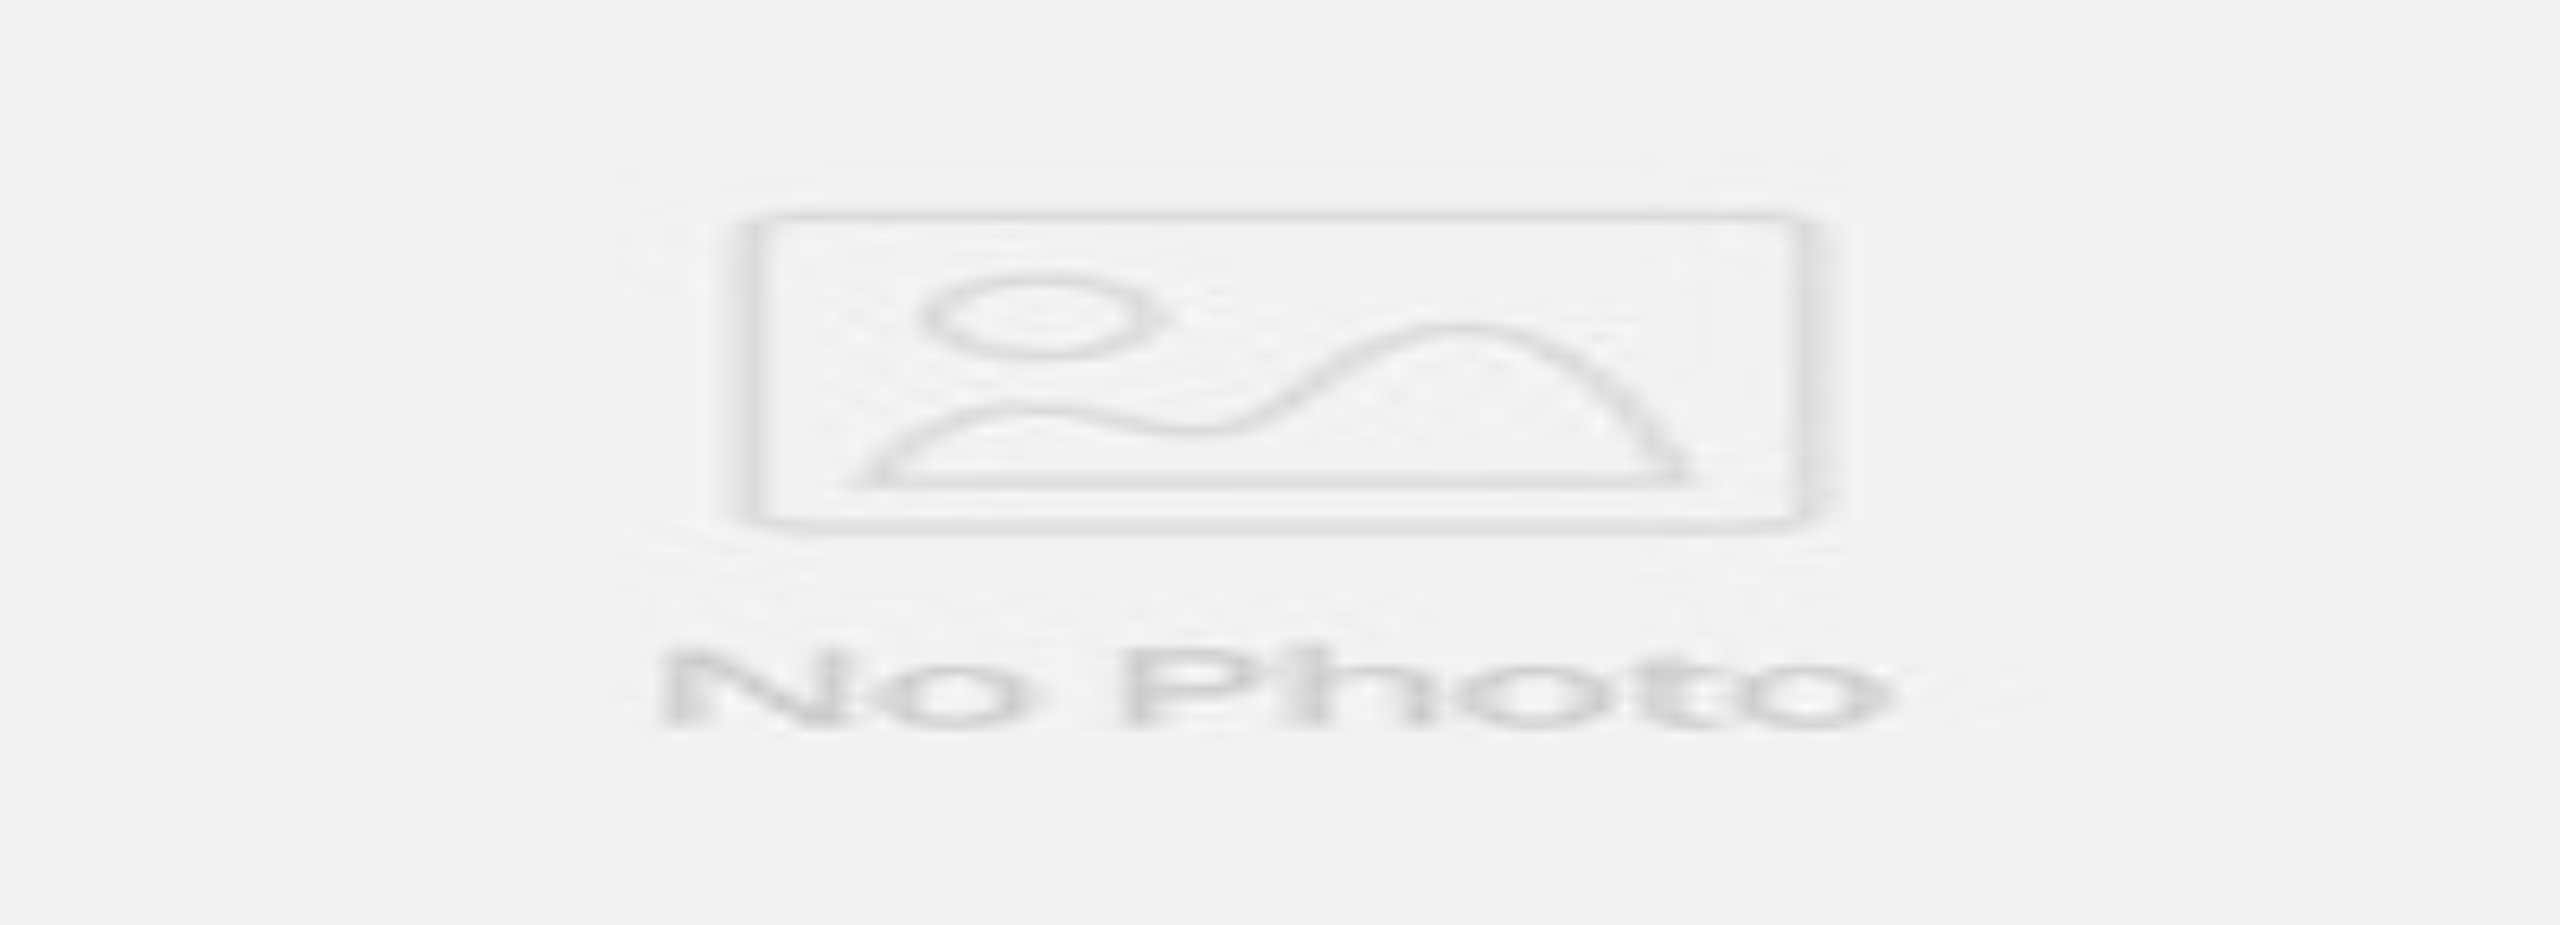 Kawasaki Outer Crankshaft Oil Seal Kit Model 650/750/800 All years WSM 009-901T OEM# 92049-3705,92049-3706 92049-3713 91-11 S5935